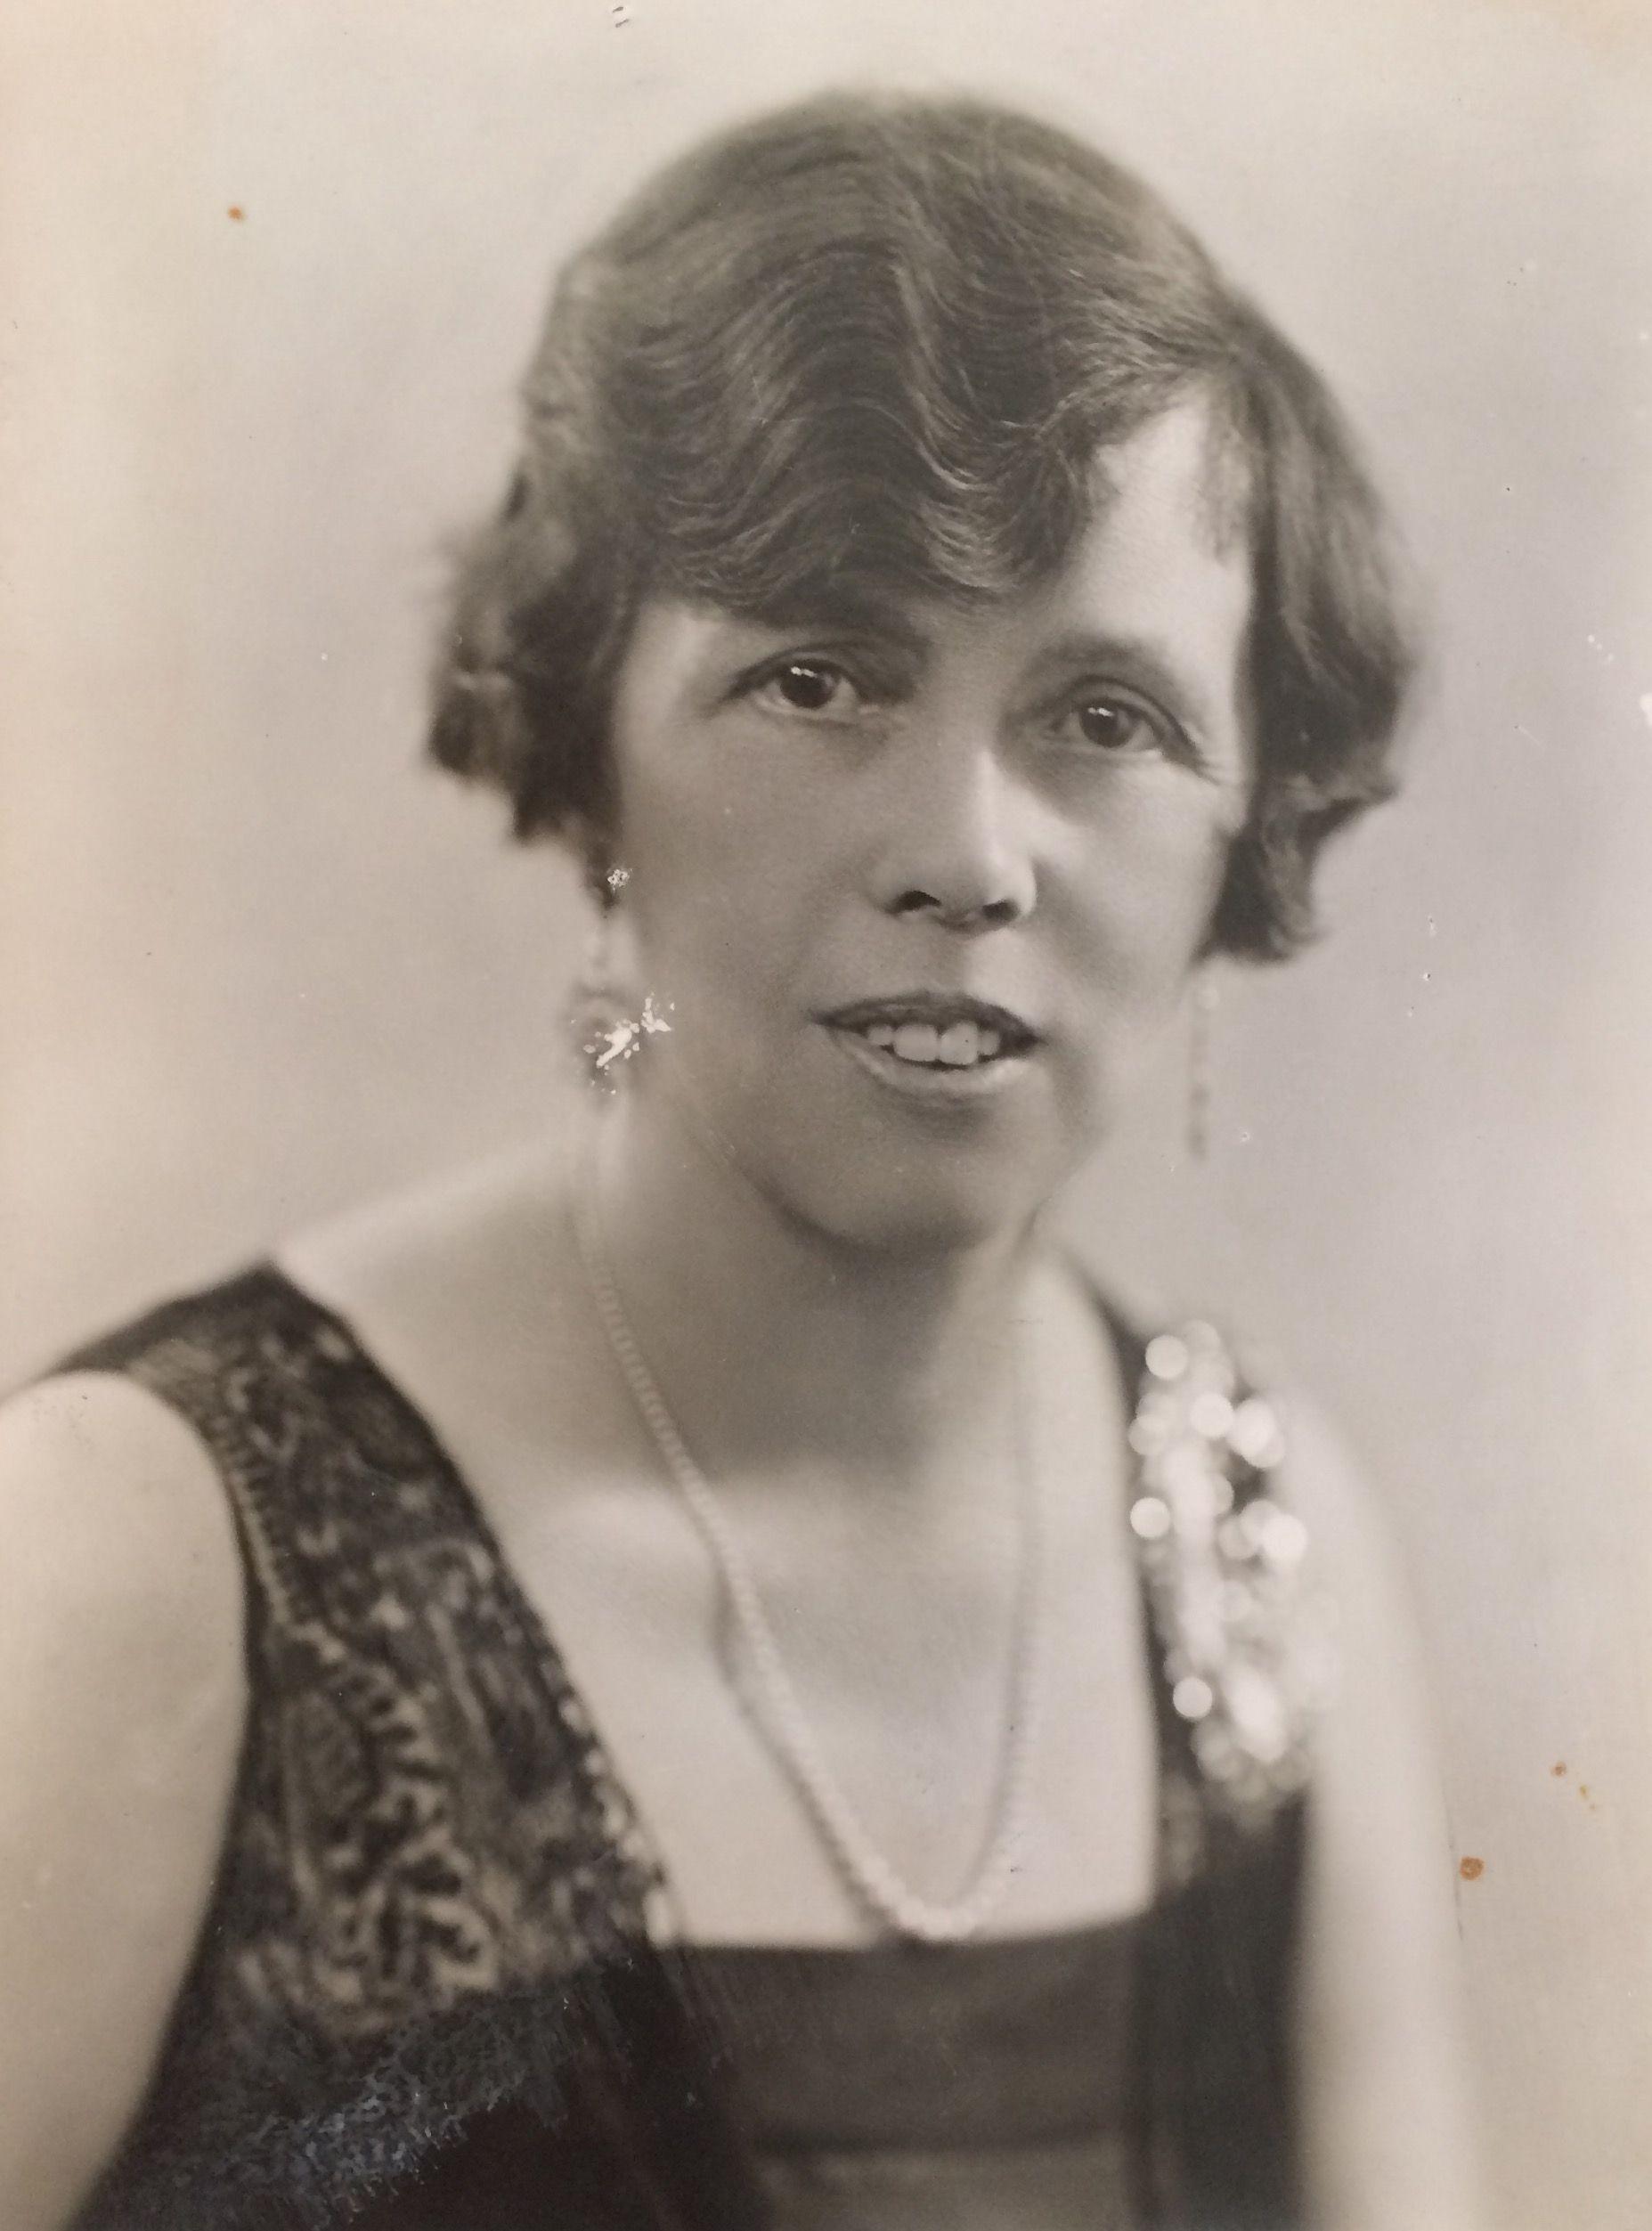 Mabel Constanduros